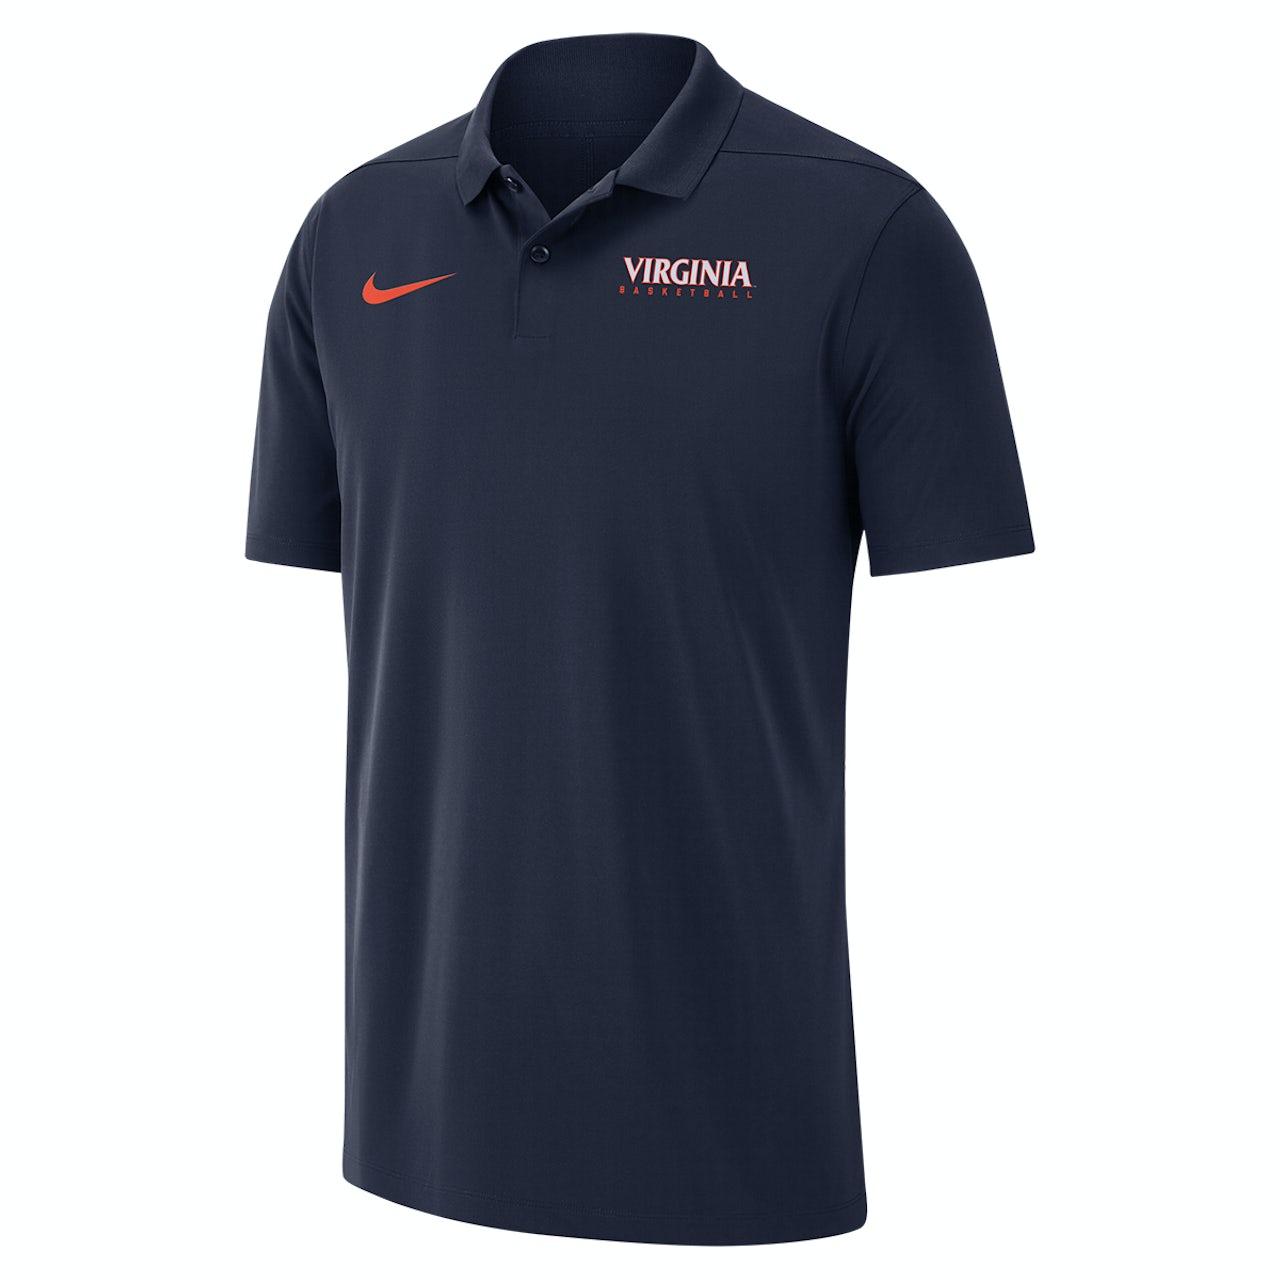 dba84049 UVA Athletics University of Virginia 2018 Nike Navy Basketball Polo